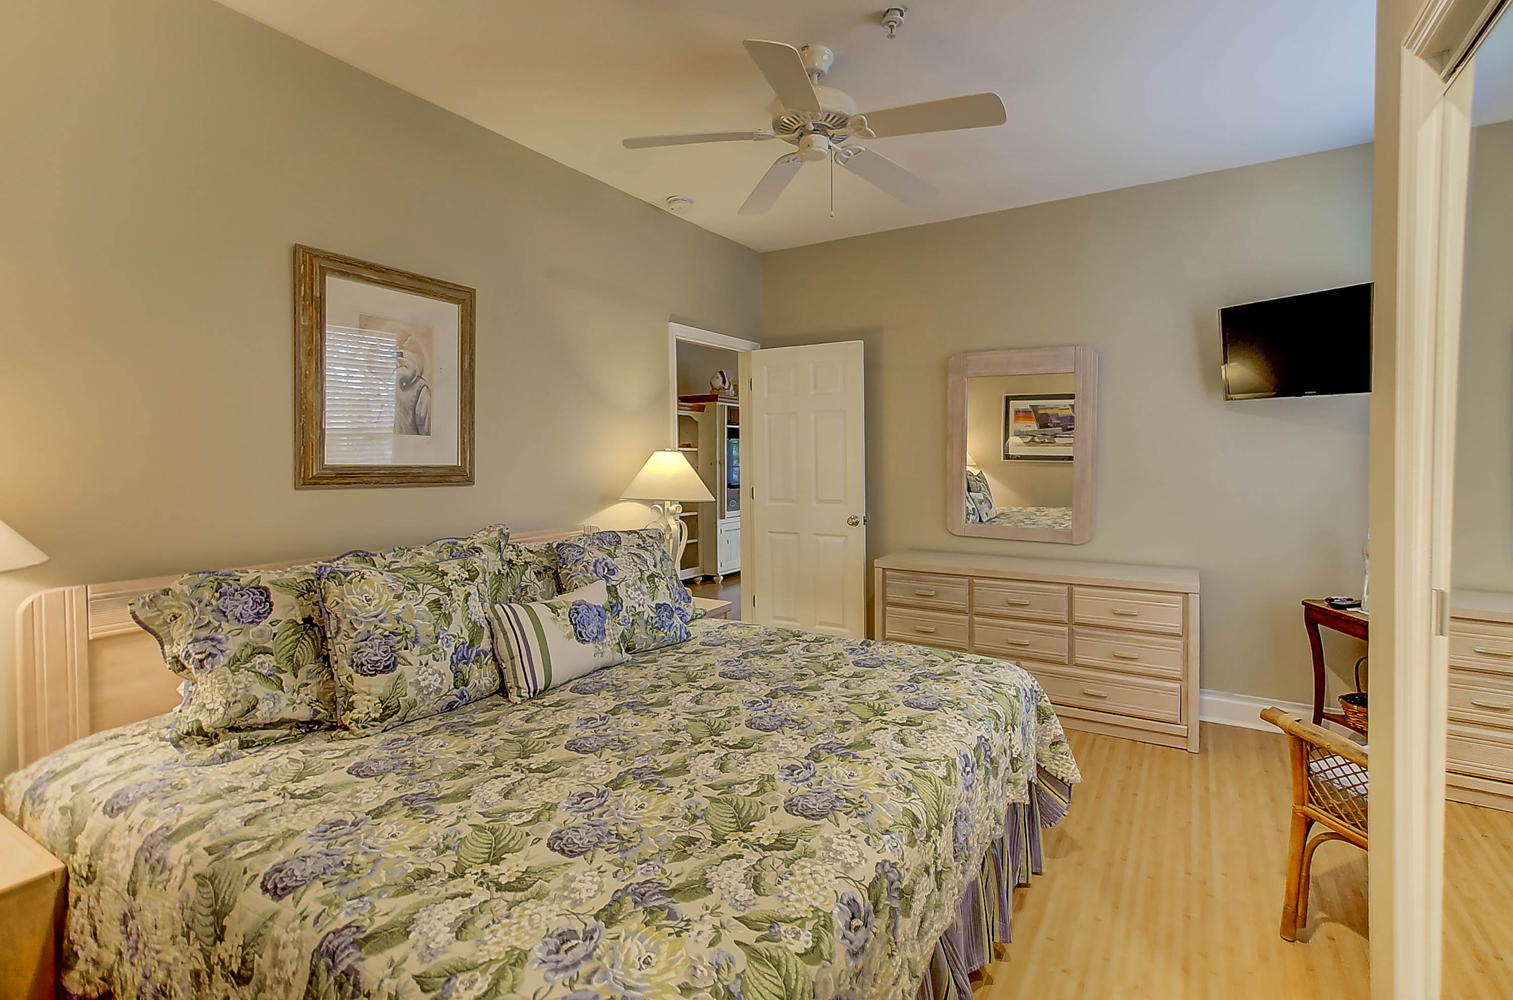 Beachwalker Villas Homes For Sale - 108 Ashley, Folly Beach, SC - 9